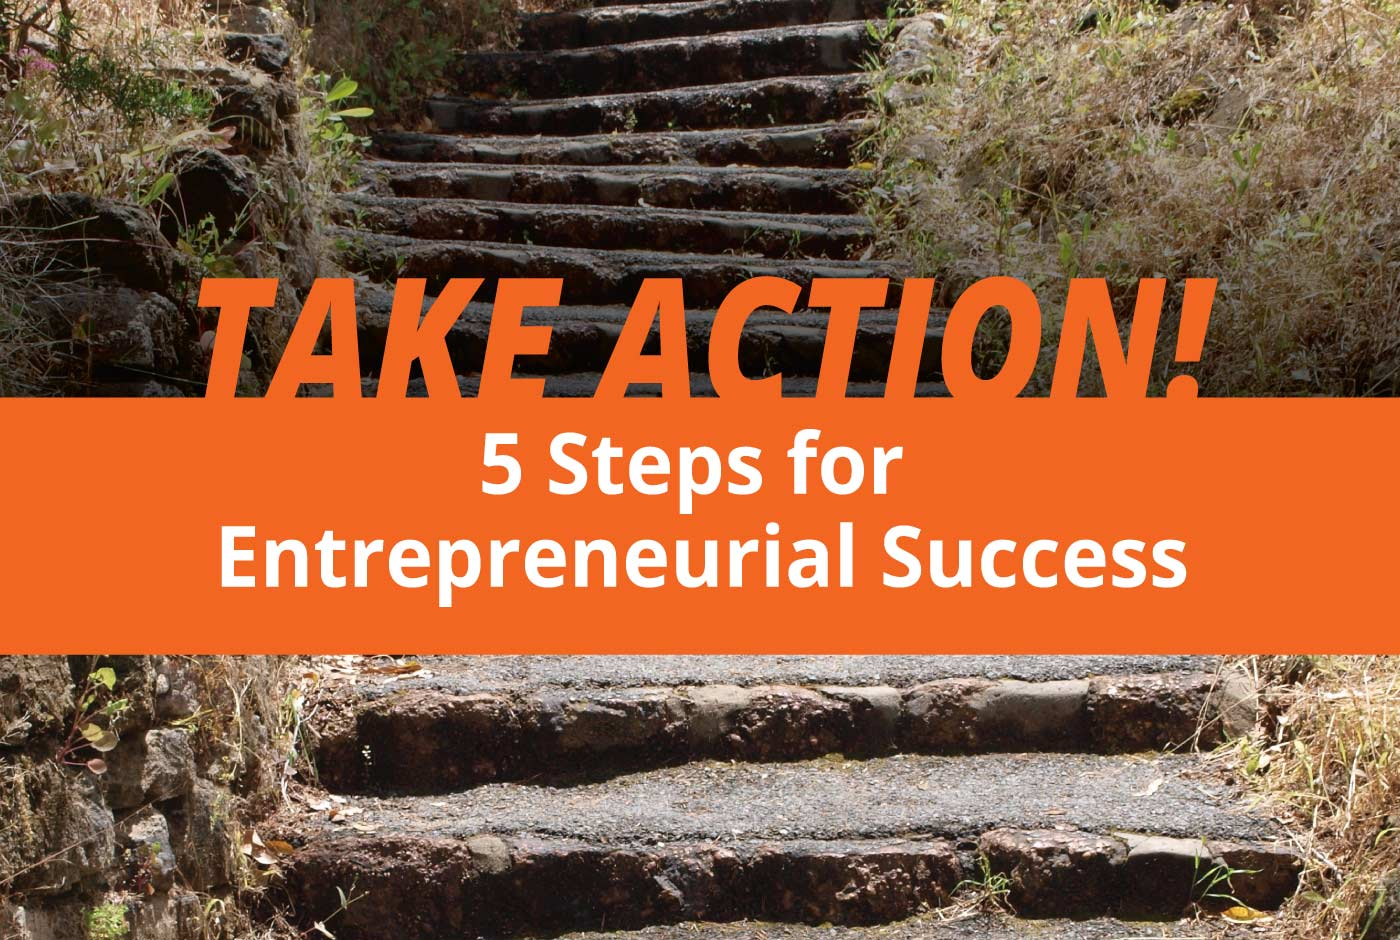 Jon Dwoskin Business Blog: Take Action: 5 Steps for Entrepreneurial Success